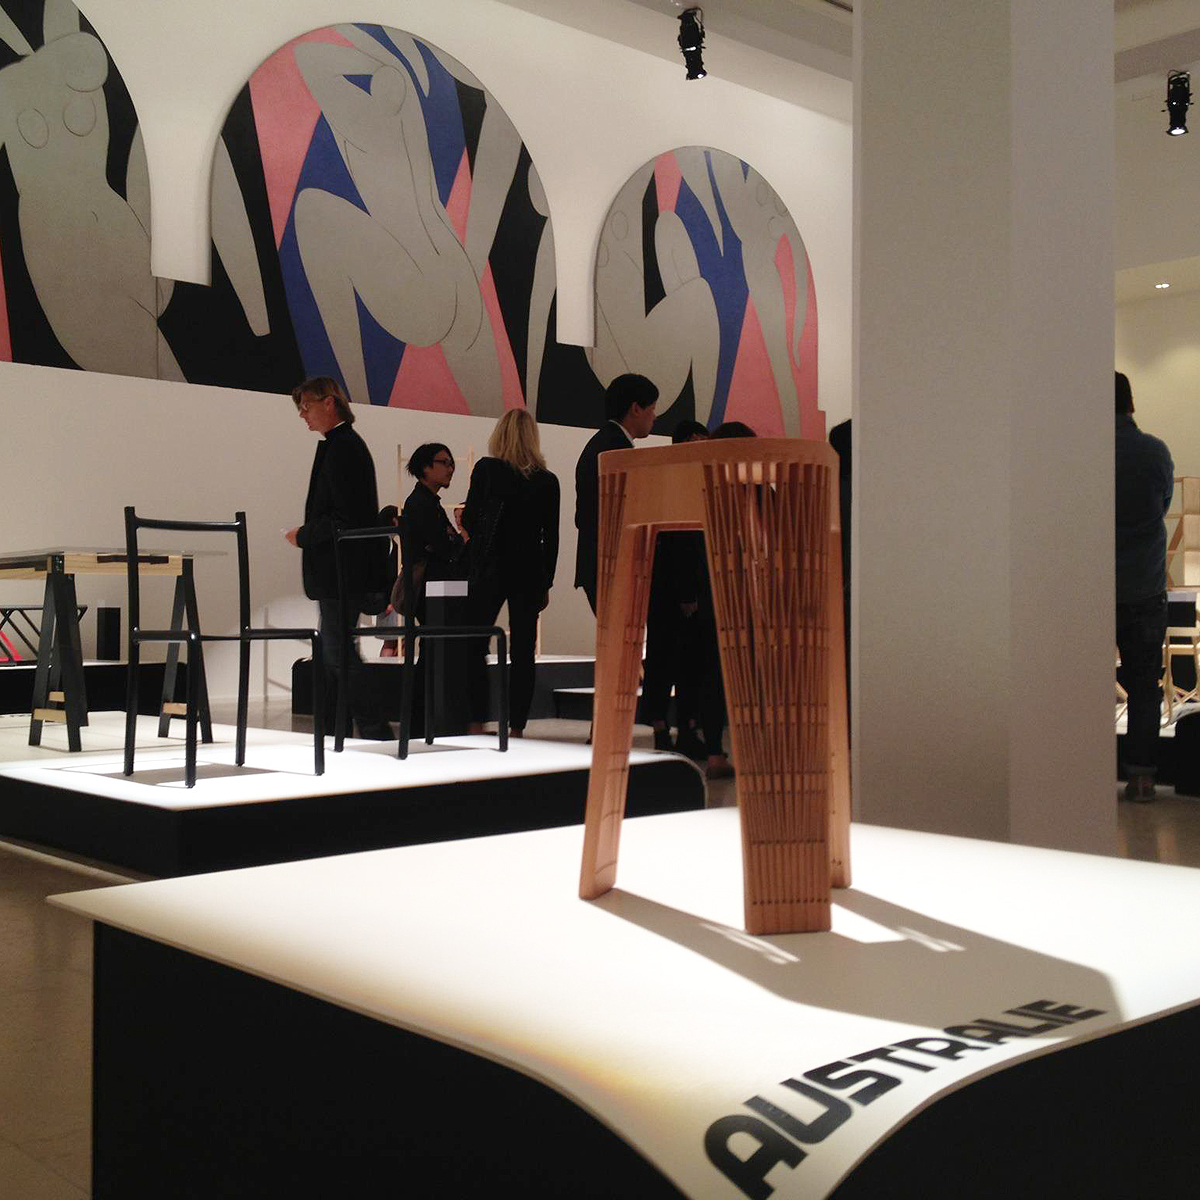 industrial design in victoria australia tate anson paris design week. Black Bedroom Furniture Sets. Home Design Ideas